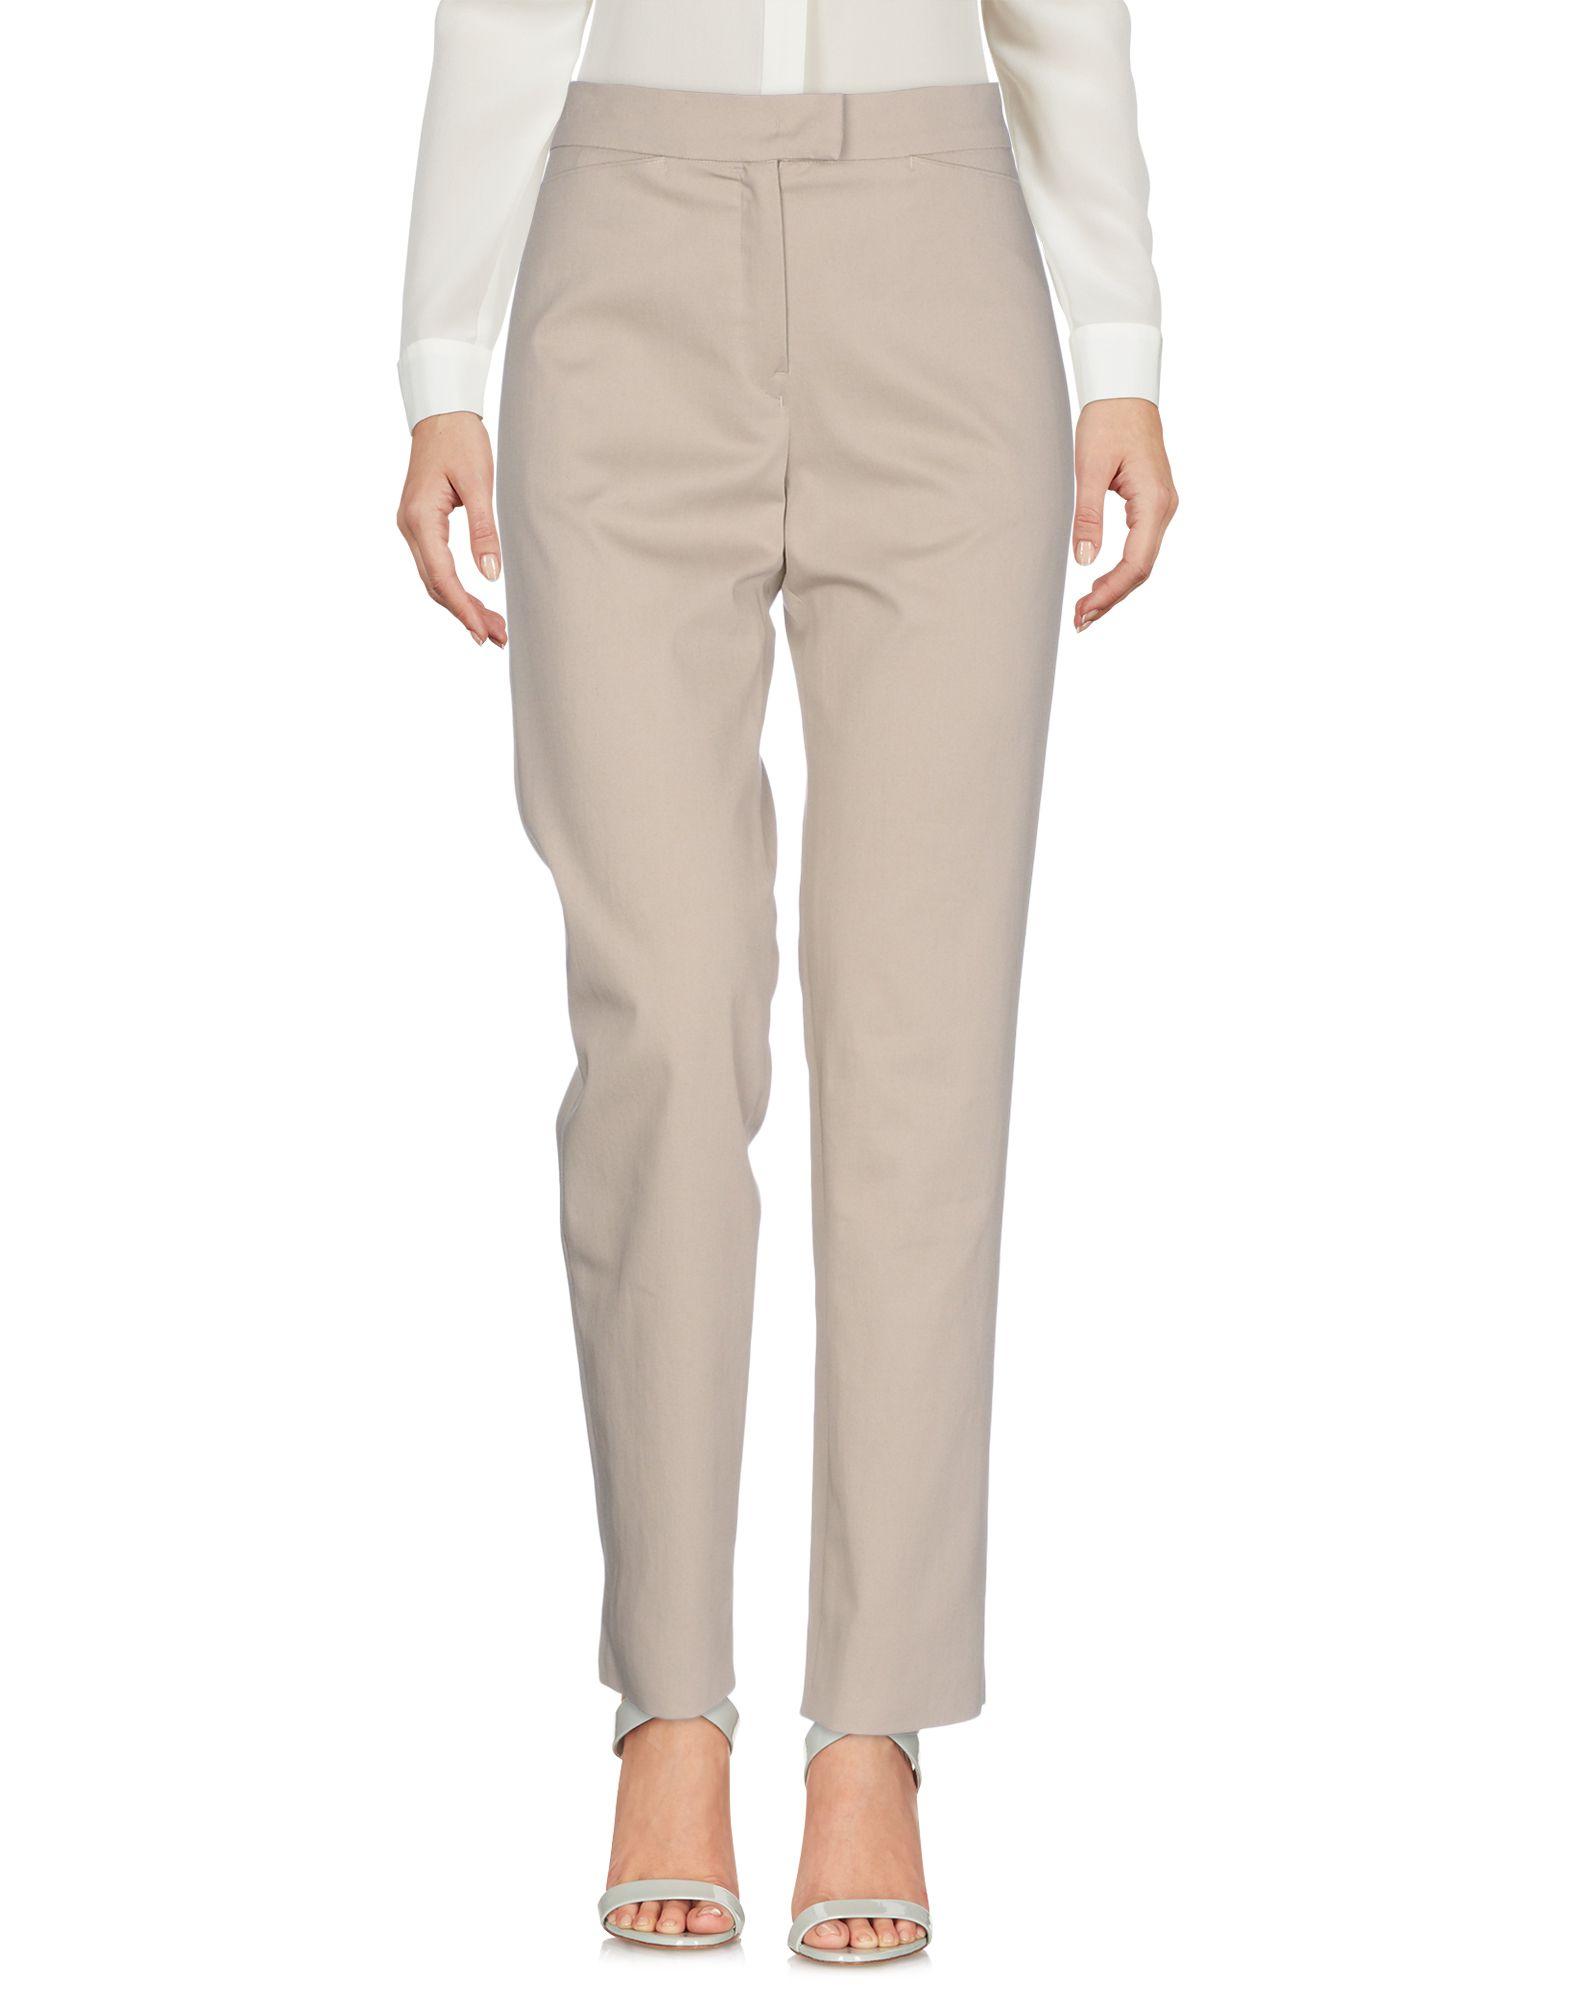 Pantalone Jil Sander Donna - Acquista online su mdGBwU